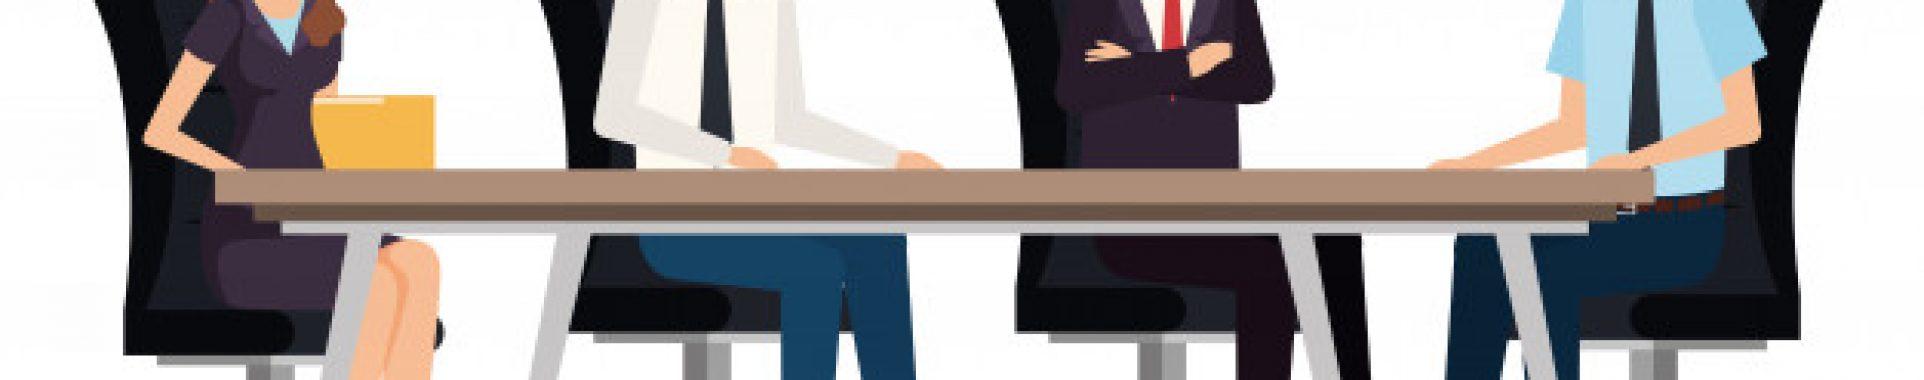 gente-negocios-sala-juntas-isometrica-avatares_24877-21404